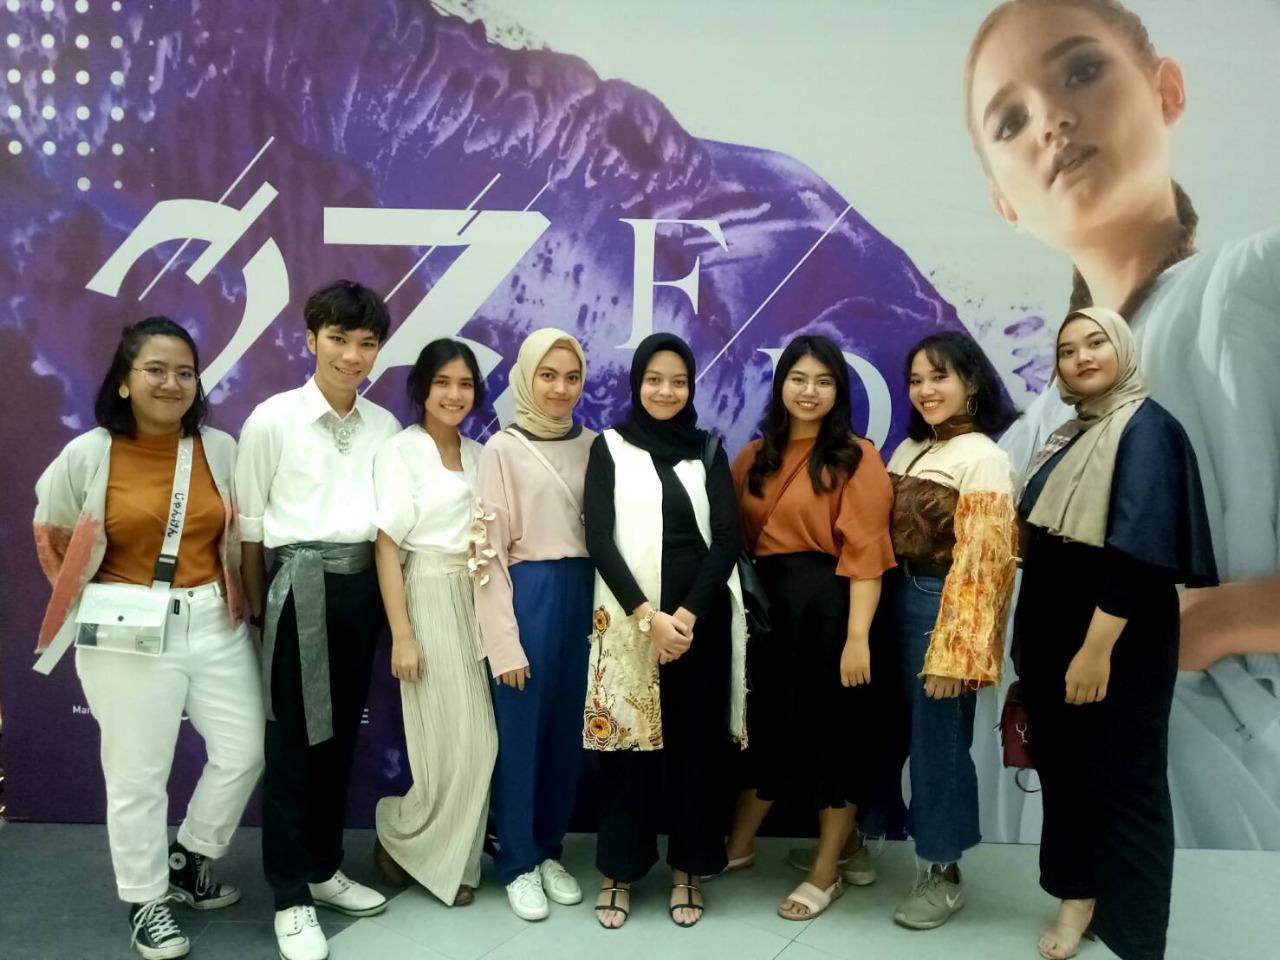 https: img-o.okeinfo.net content 2018 09 12 65 1949634 mahasiswa-itb-tampil-dalam-pameran-fashion-terbesar-di-bandung-s4KpnRLDwz.jpeg